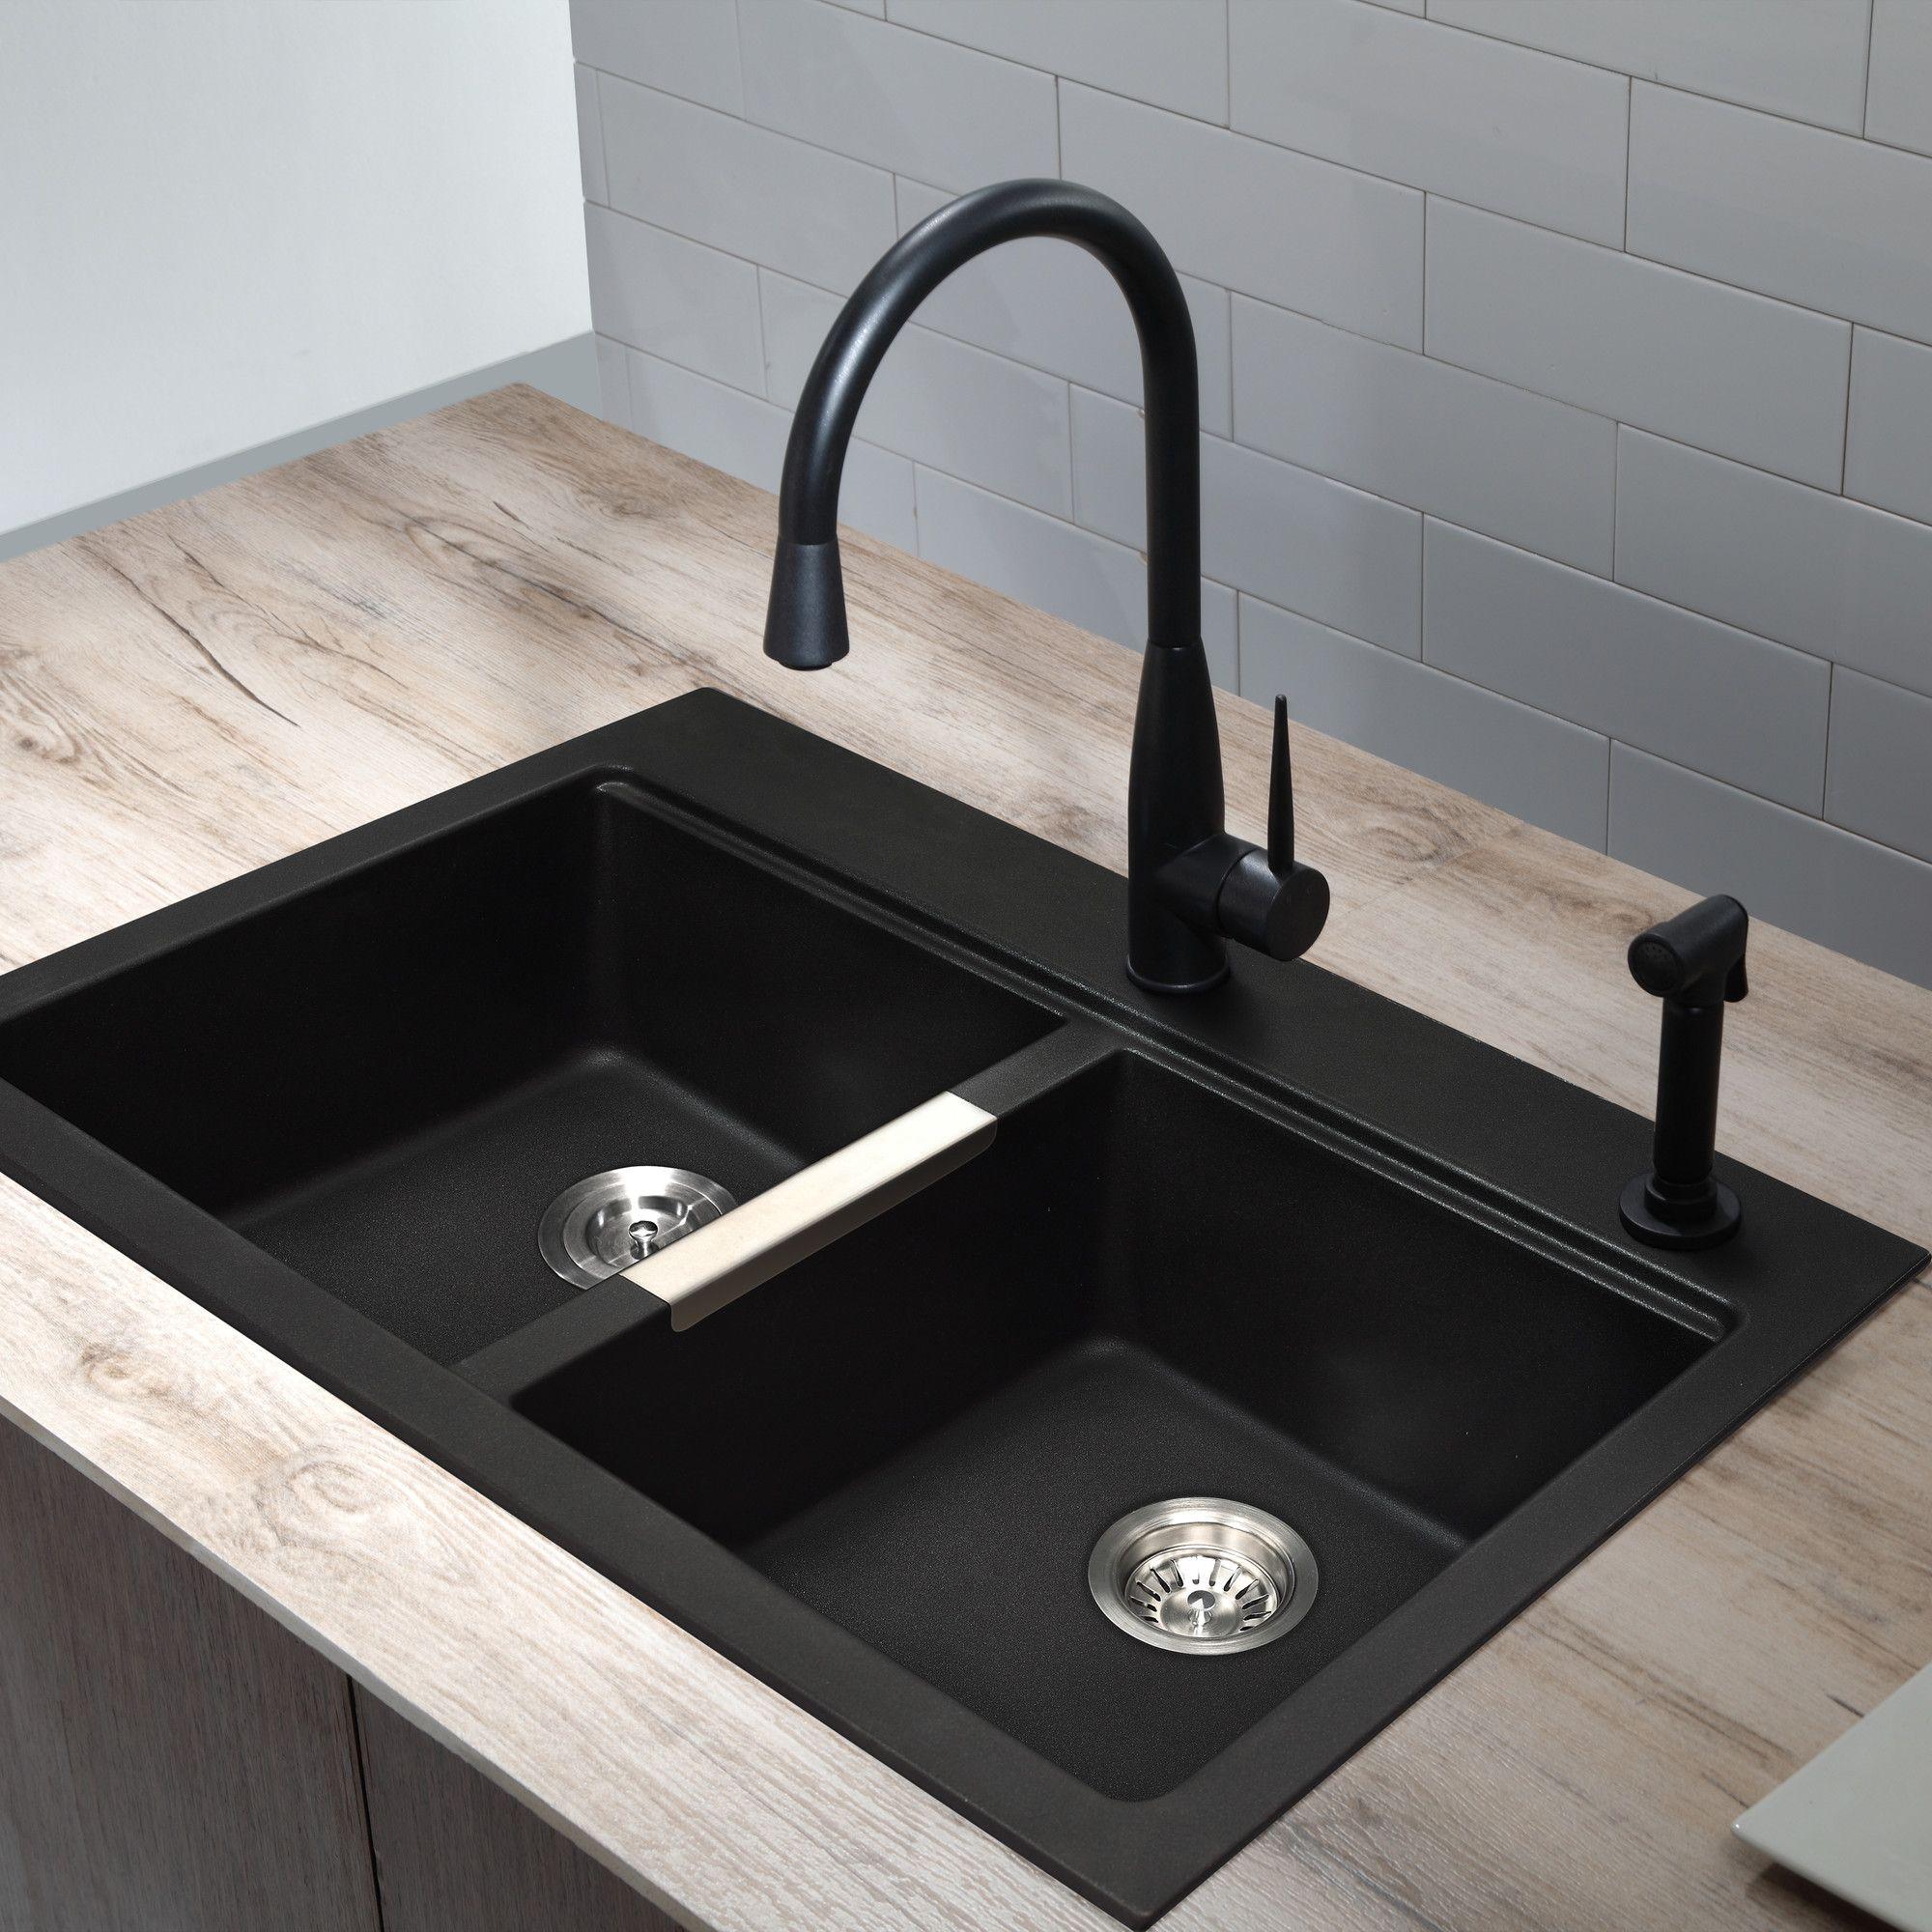 33 5 X 22 Dual Mount 50 50 Double Bowl Granite Kitchen Sink Black Kitchen Sink Granite Kitchen Sinks Undermount Kitchen Sinks